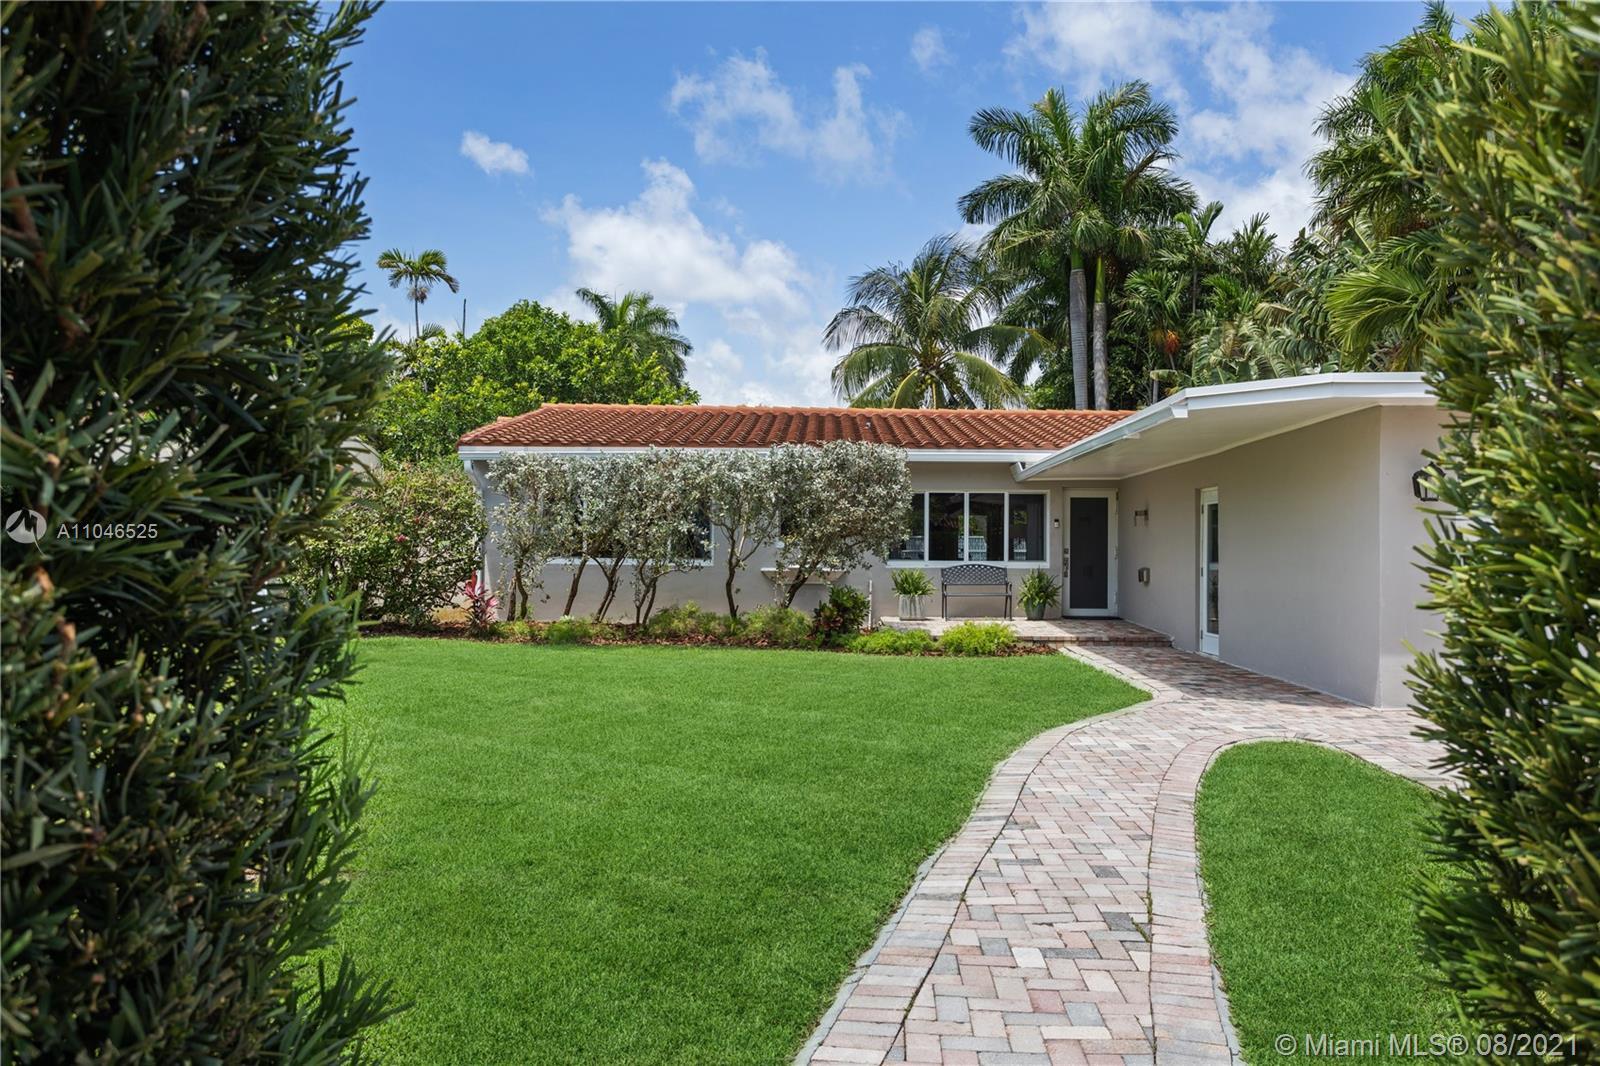 La Gorce Golf - 5750 Alton Rd, Miami Beach, FL 33140